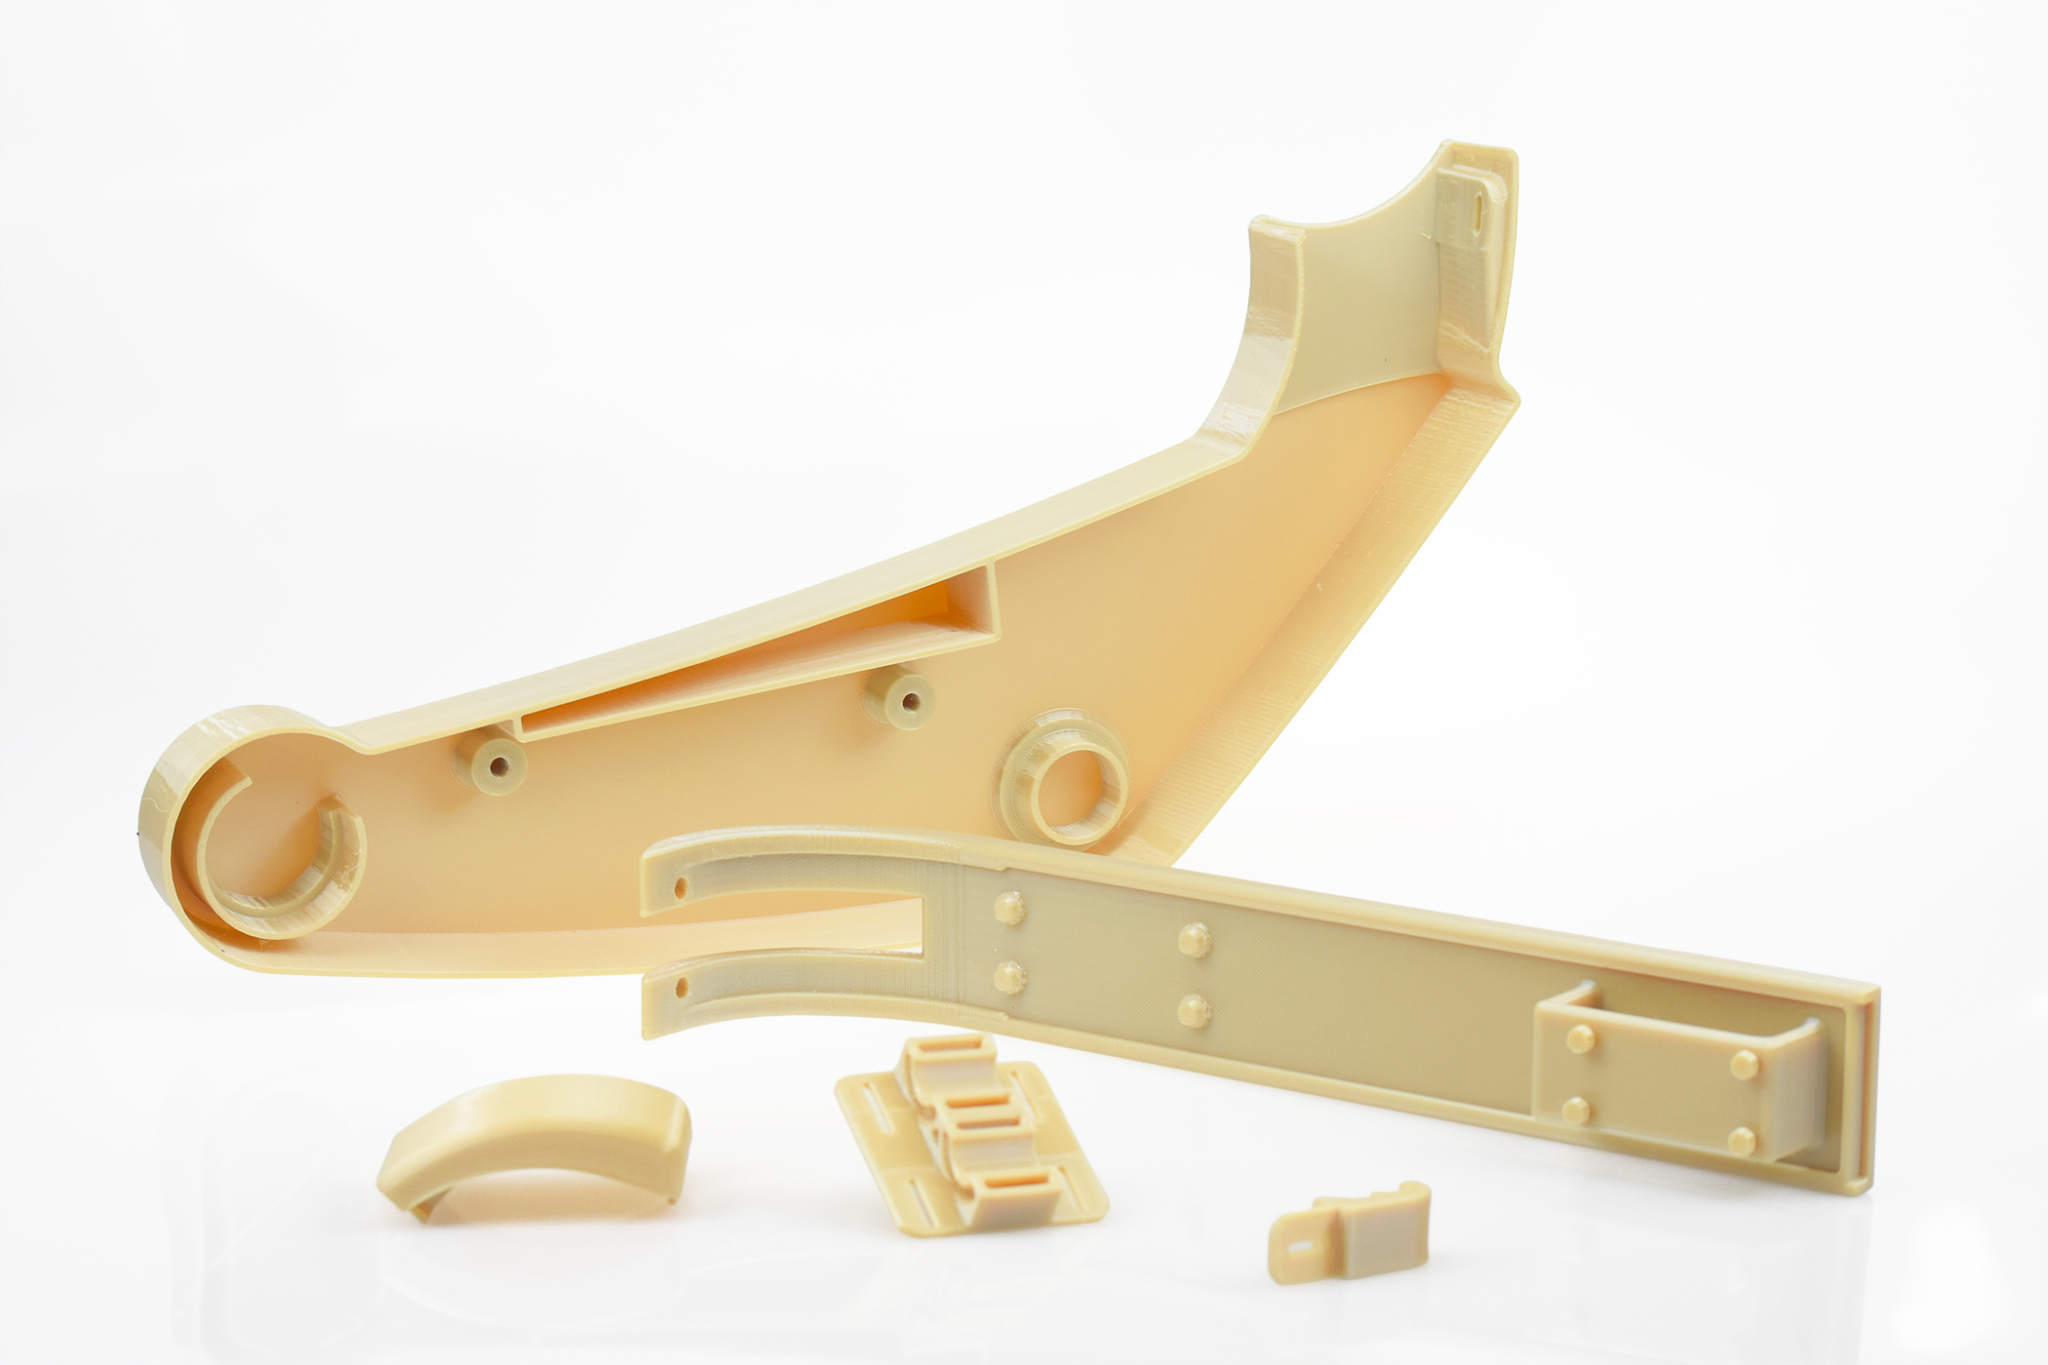 Brackets 3D printed on the Fortus 900mc Production 3D Printer. Image via Stratasys.